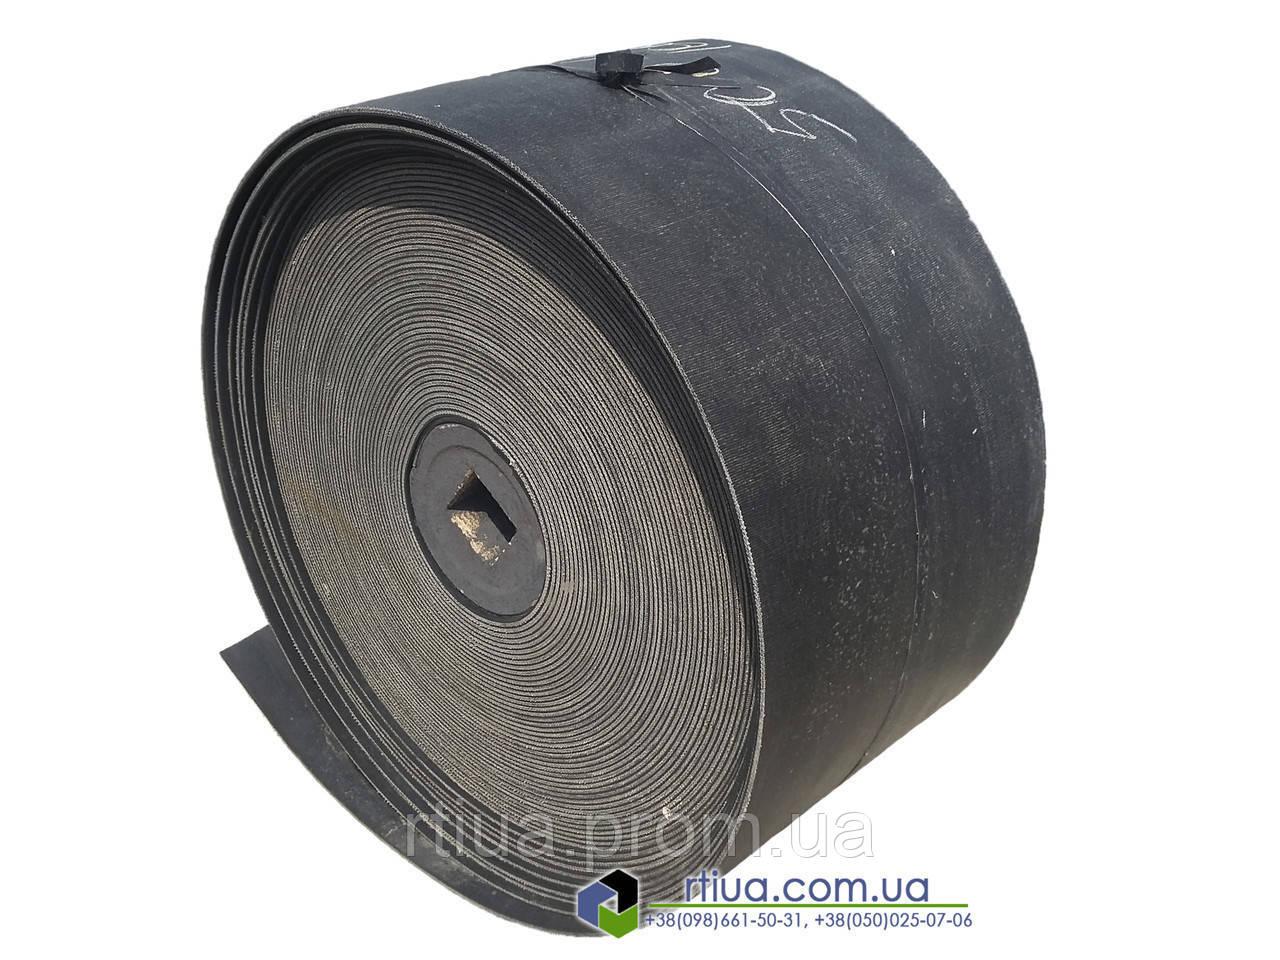 Конвейерная лента 175х5 мм